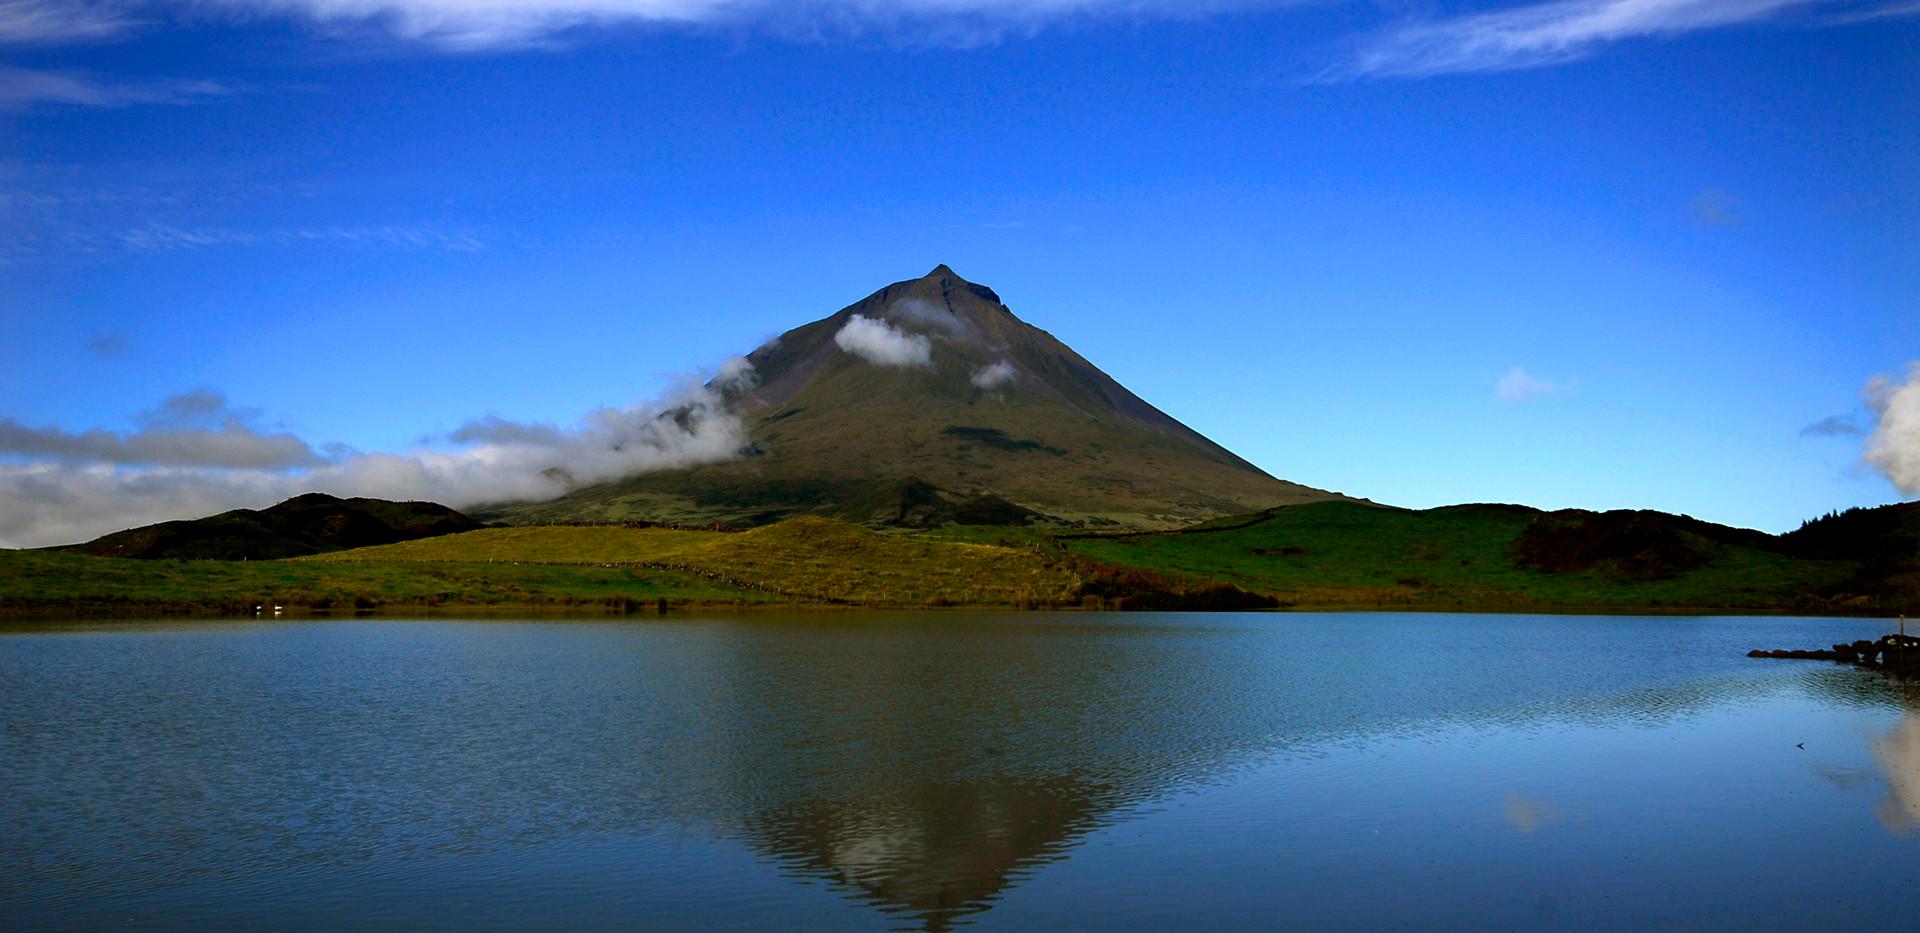 Montanha.jpg